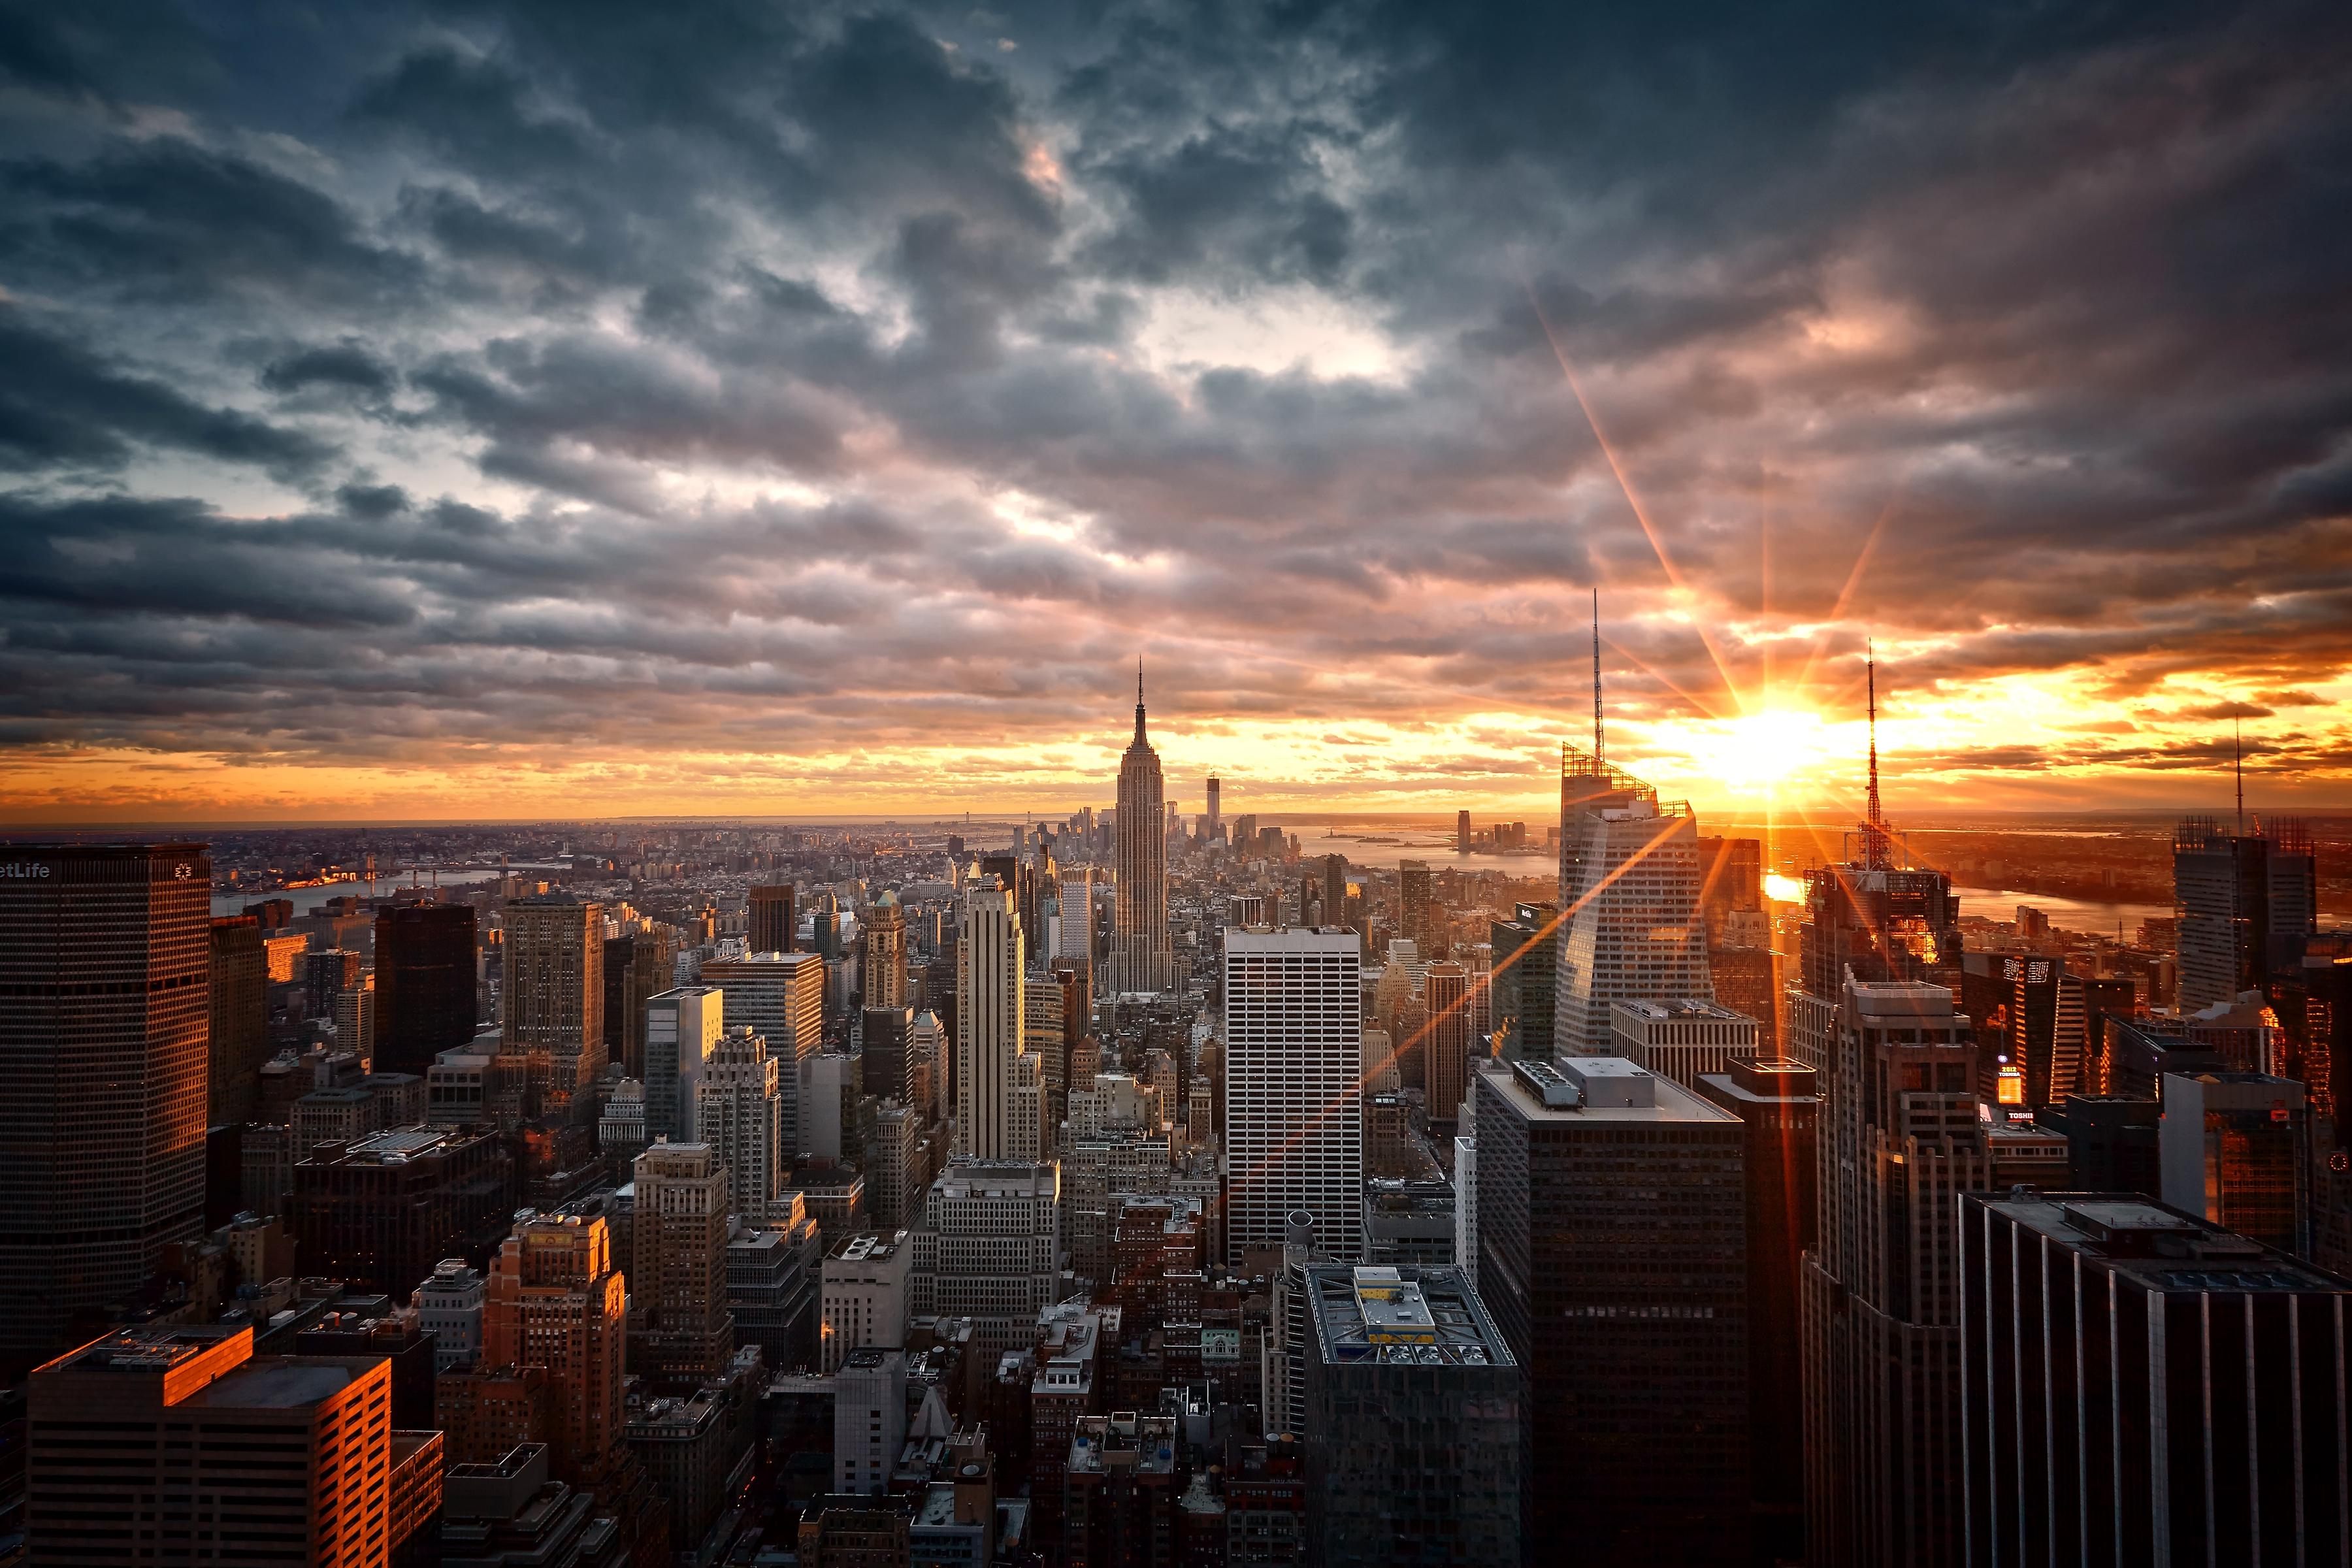 Usa New York Top View Wallpaper Hd Nature 4k Wallpapers